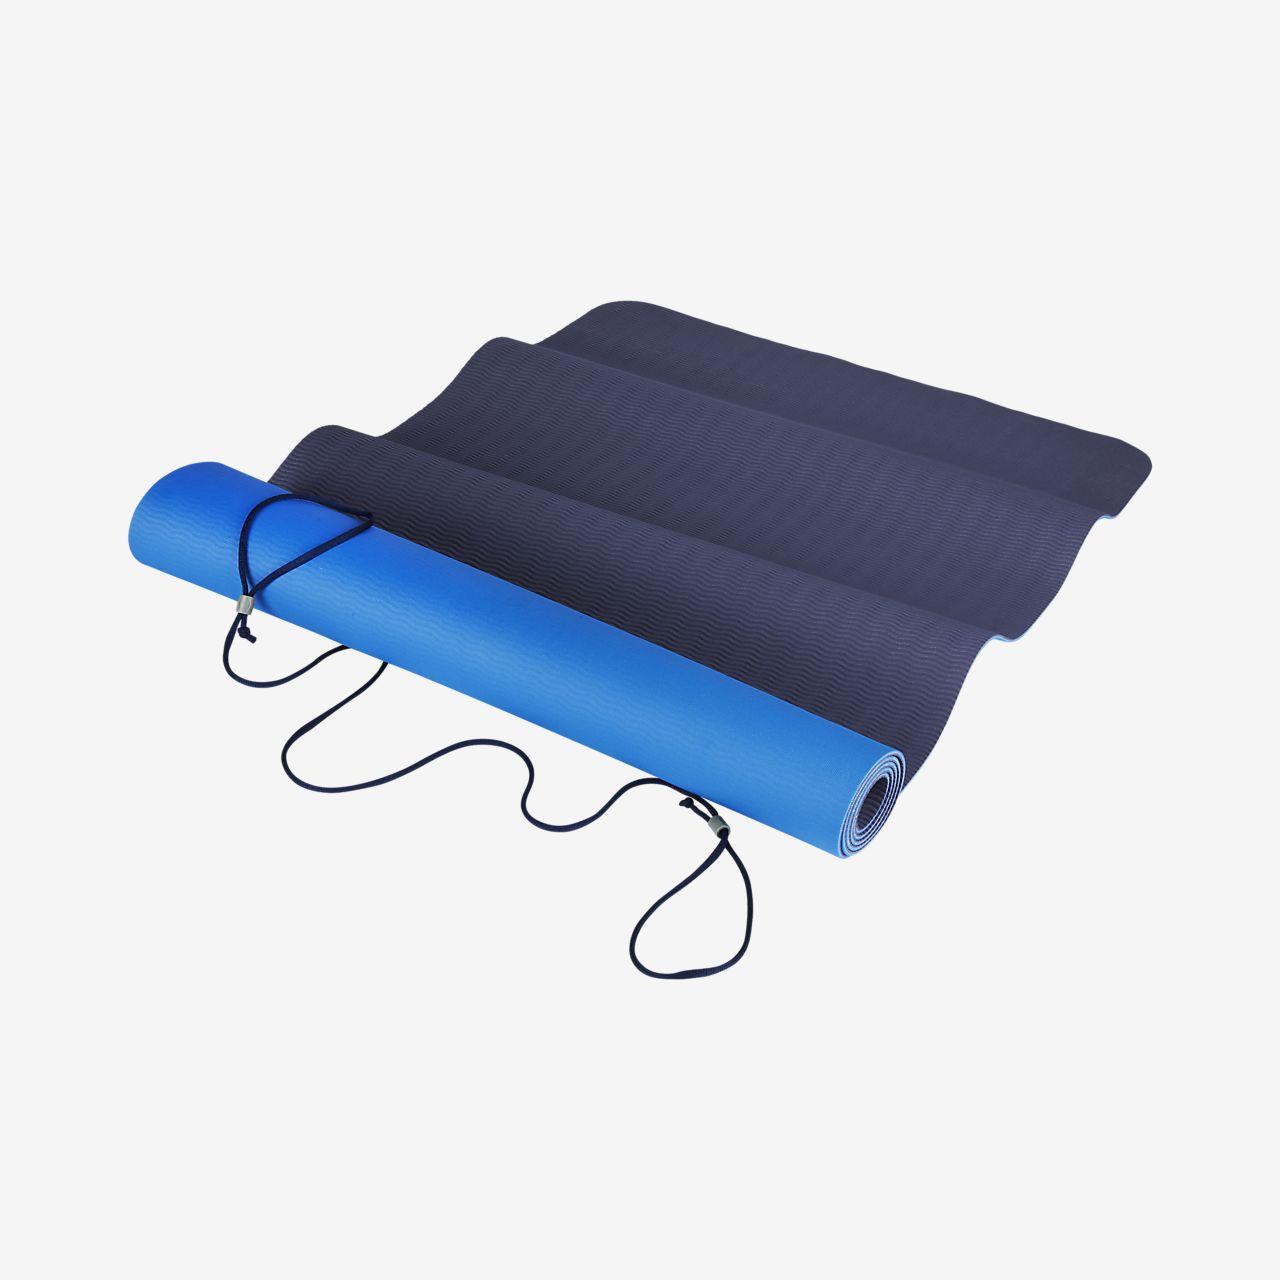 Esteira de ioga 2.0 Nike JDI